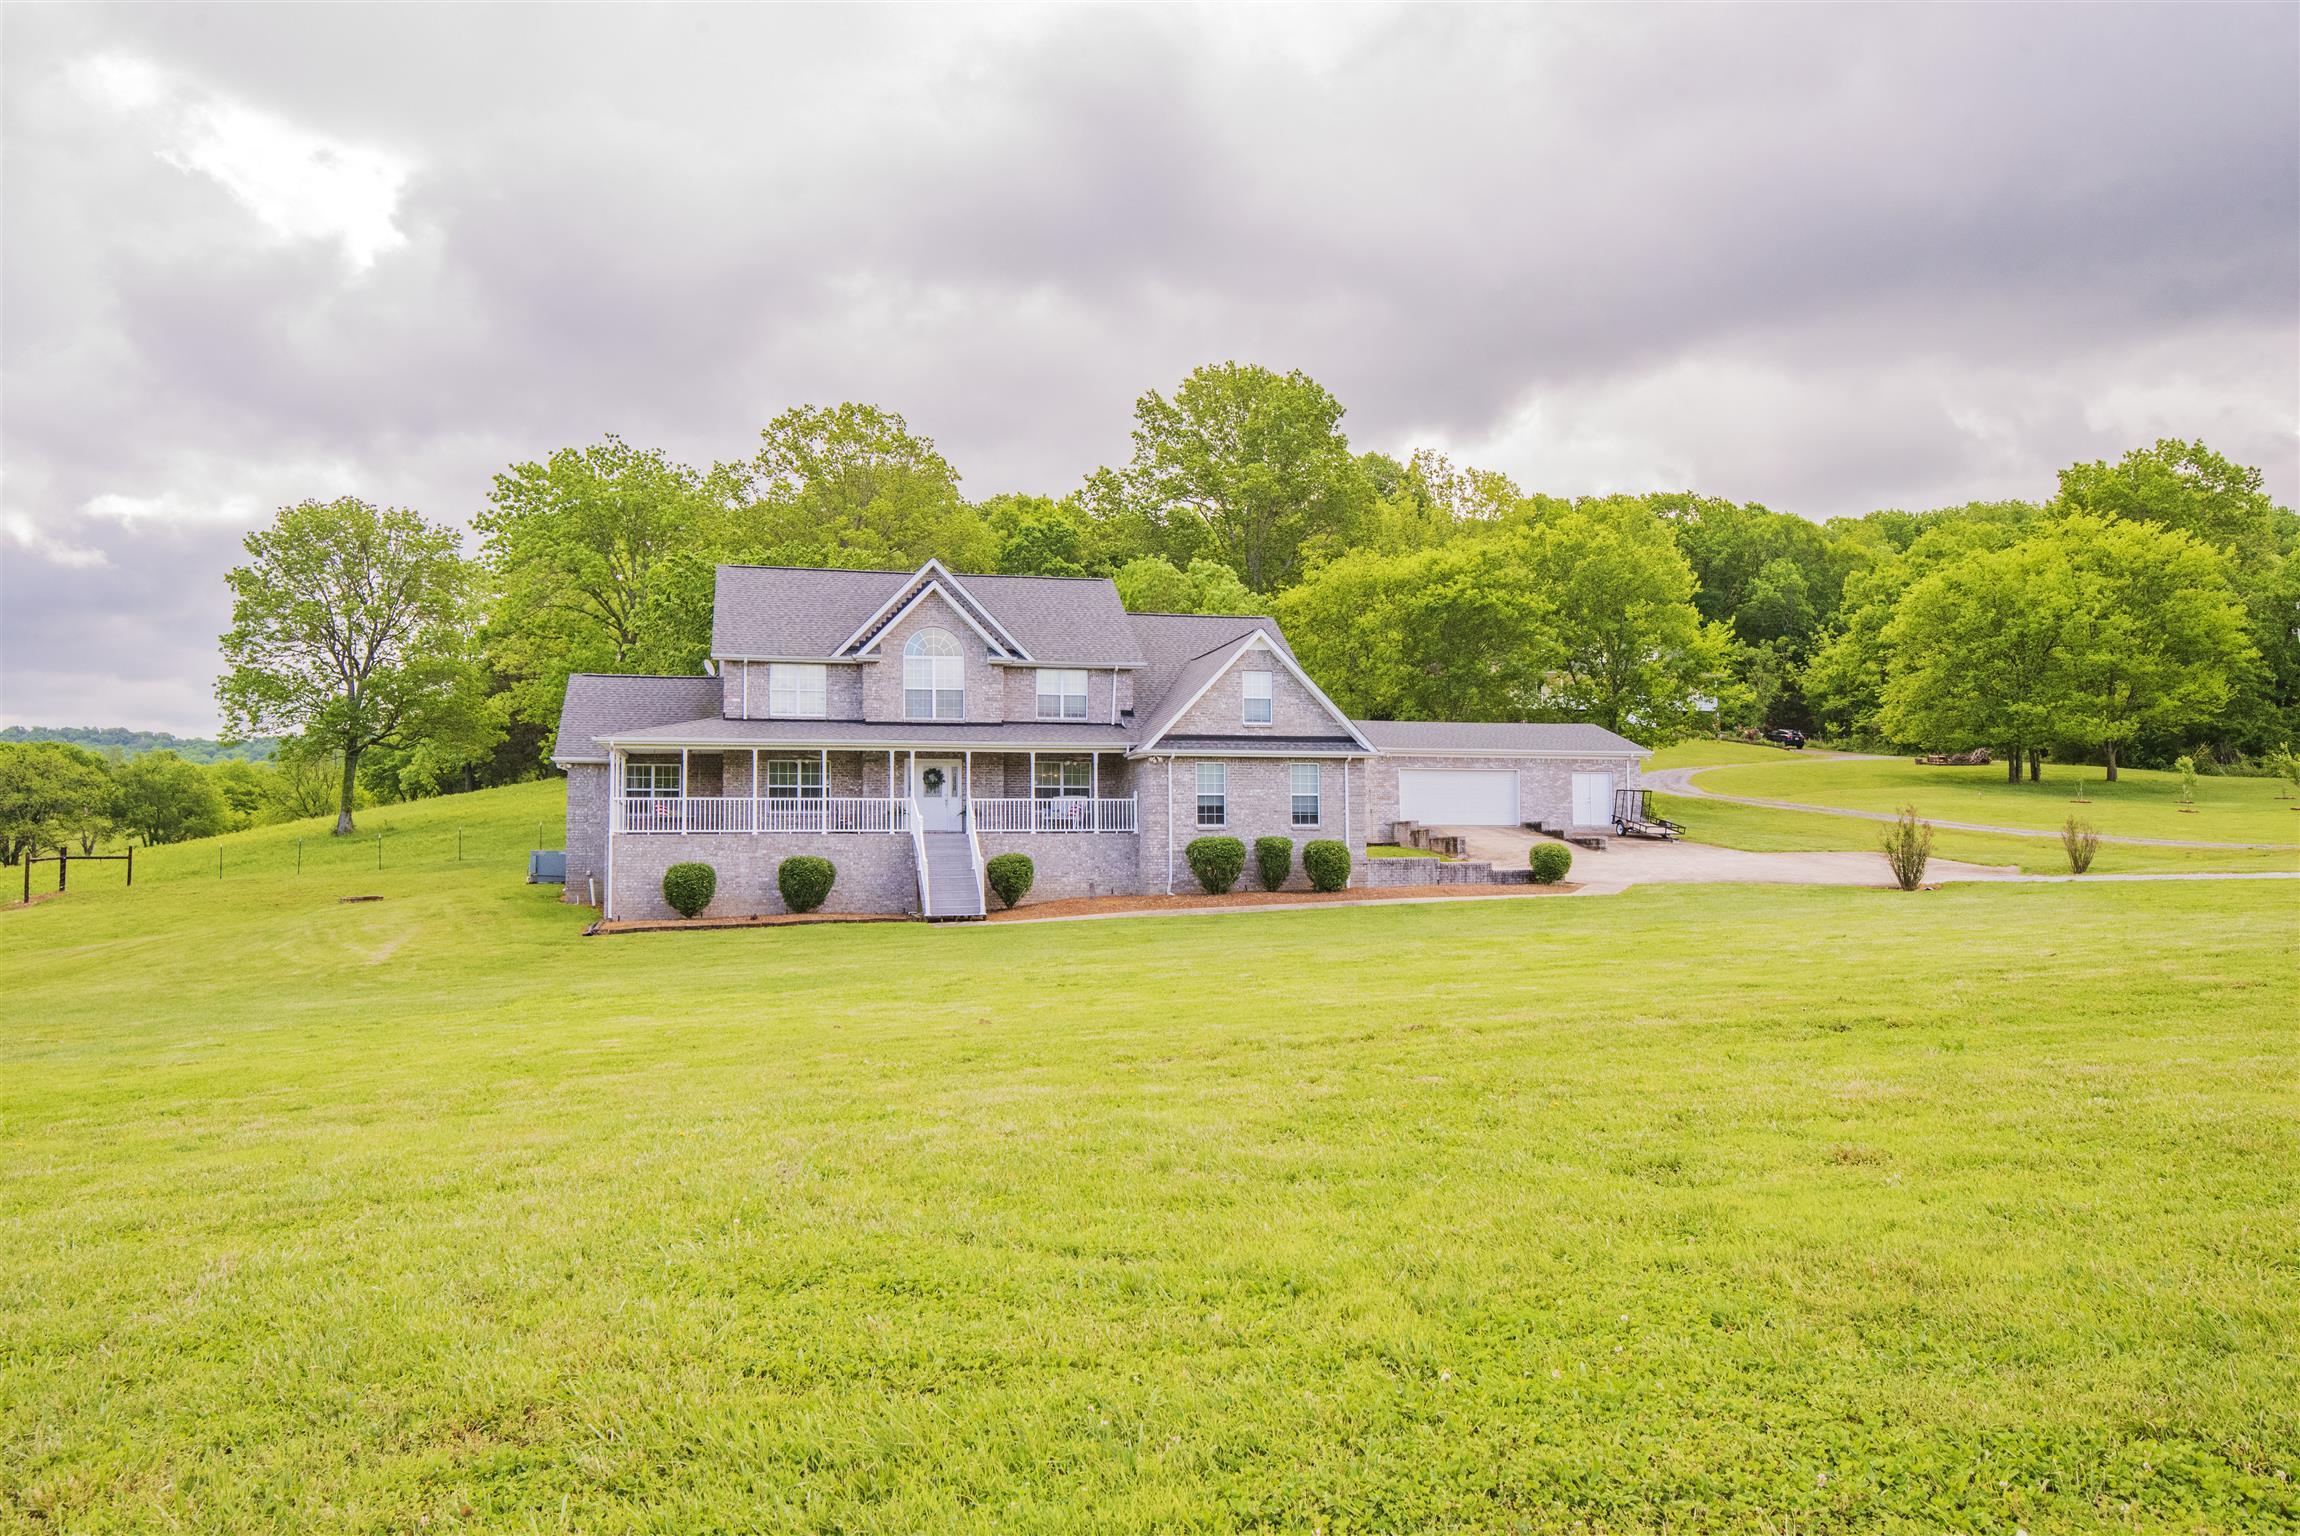 75 Choctaw Dr, Bradyville, TN 37026 - Bradyville, TN real estate listing